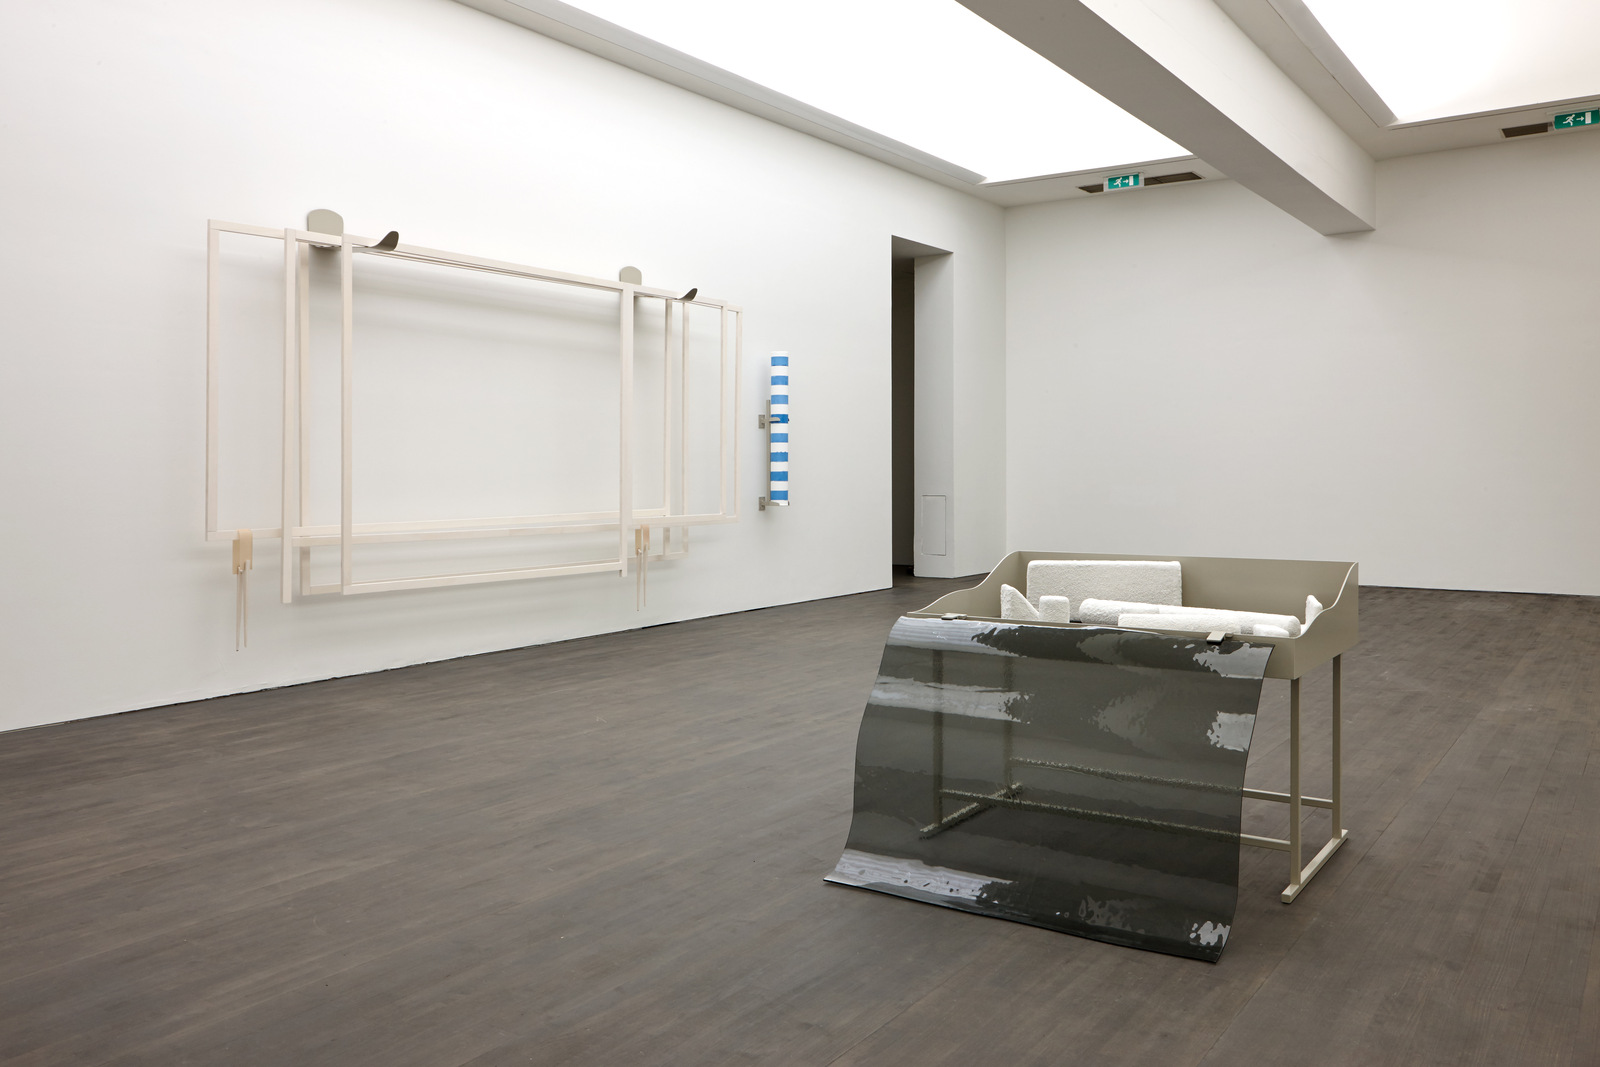 Nairy Baghramian_Fourth Wall (proscenium)_Formage de tete (Vitrine Rafraichiree)_installation S.M.A.K. 2016_Photo Dirk Pauwels_01